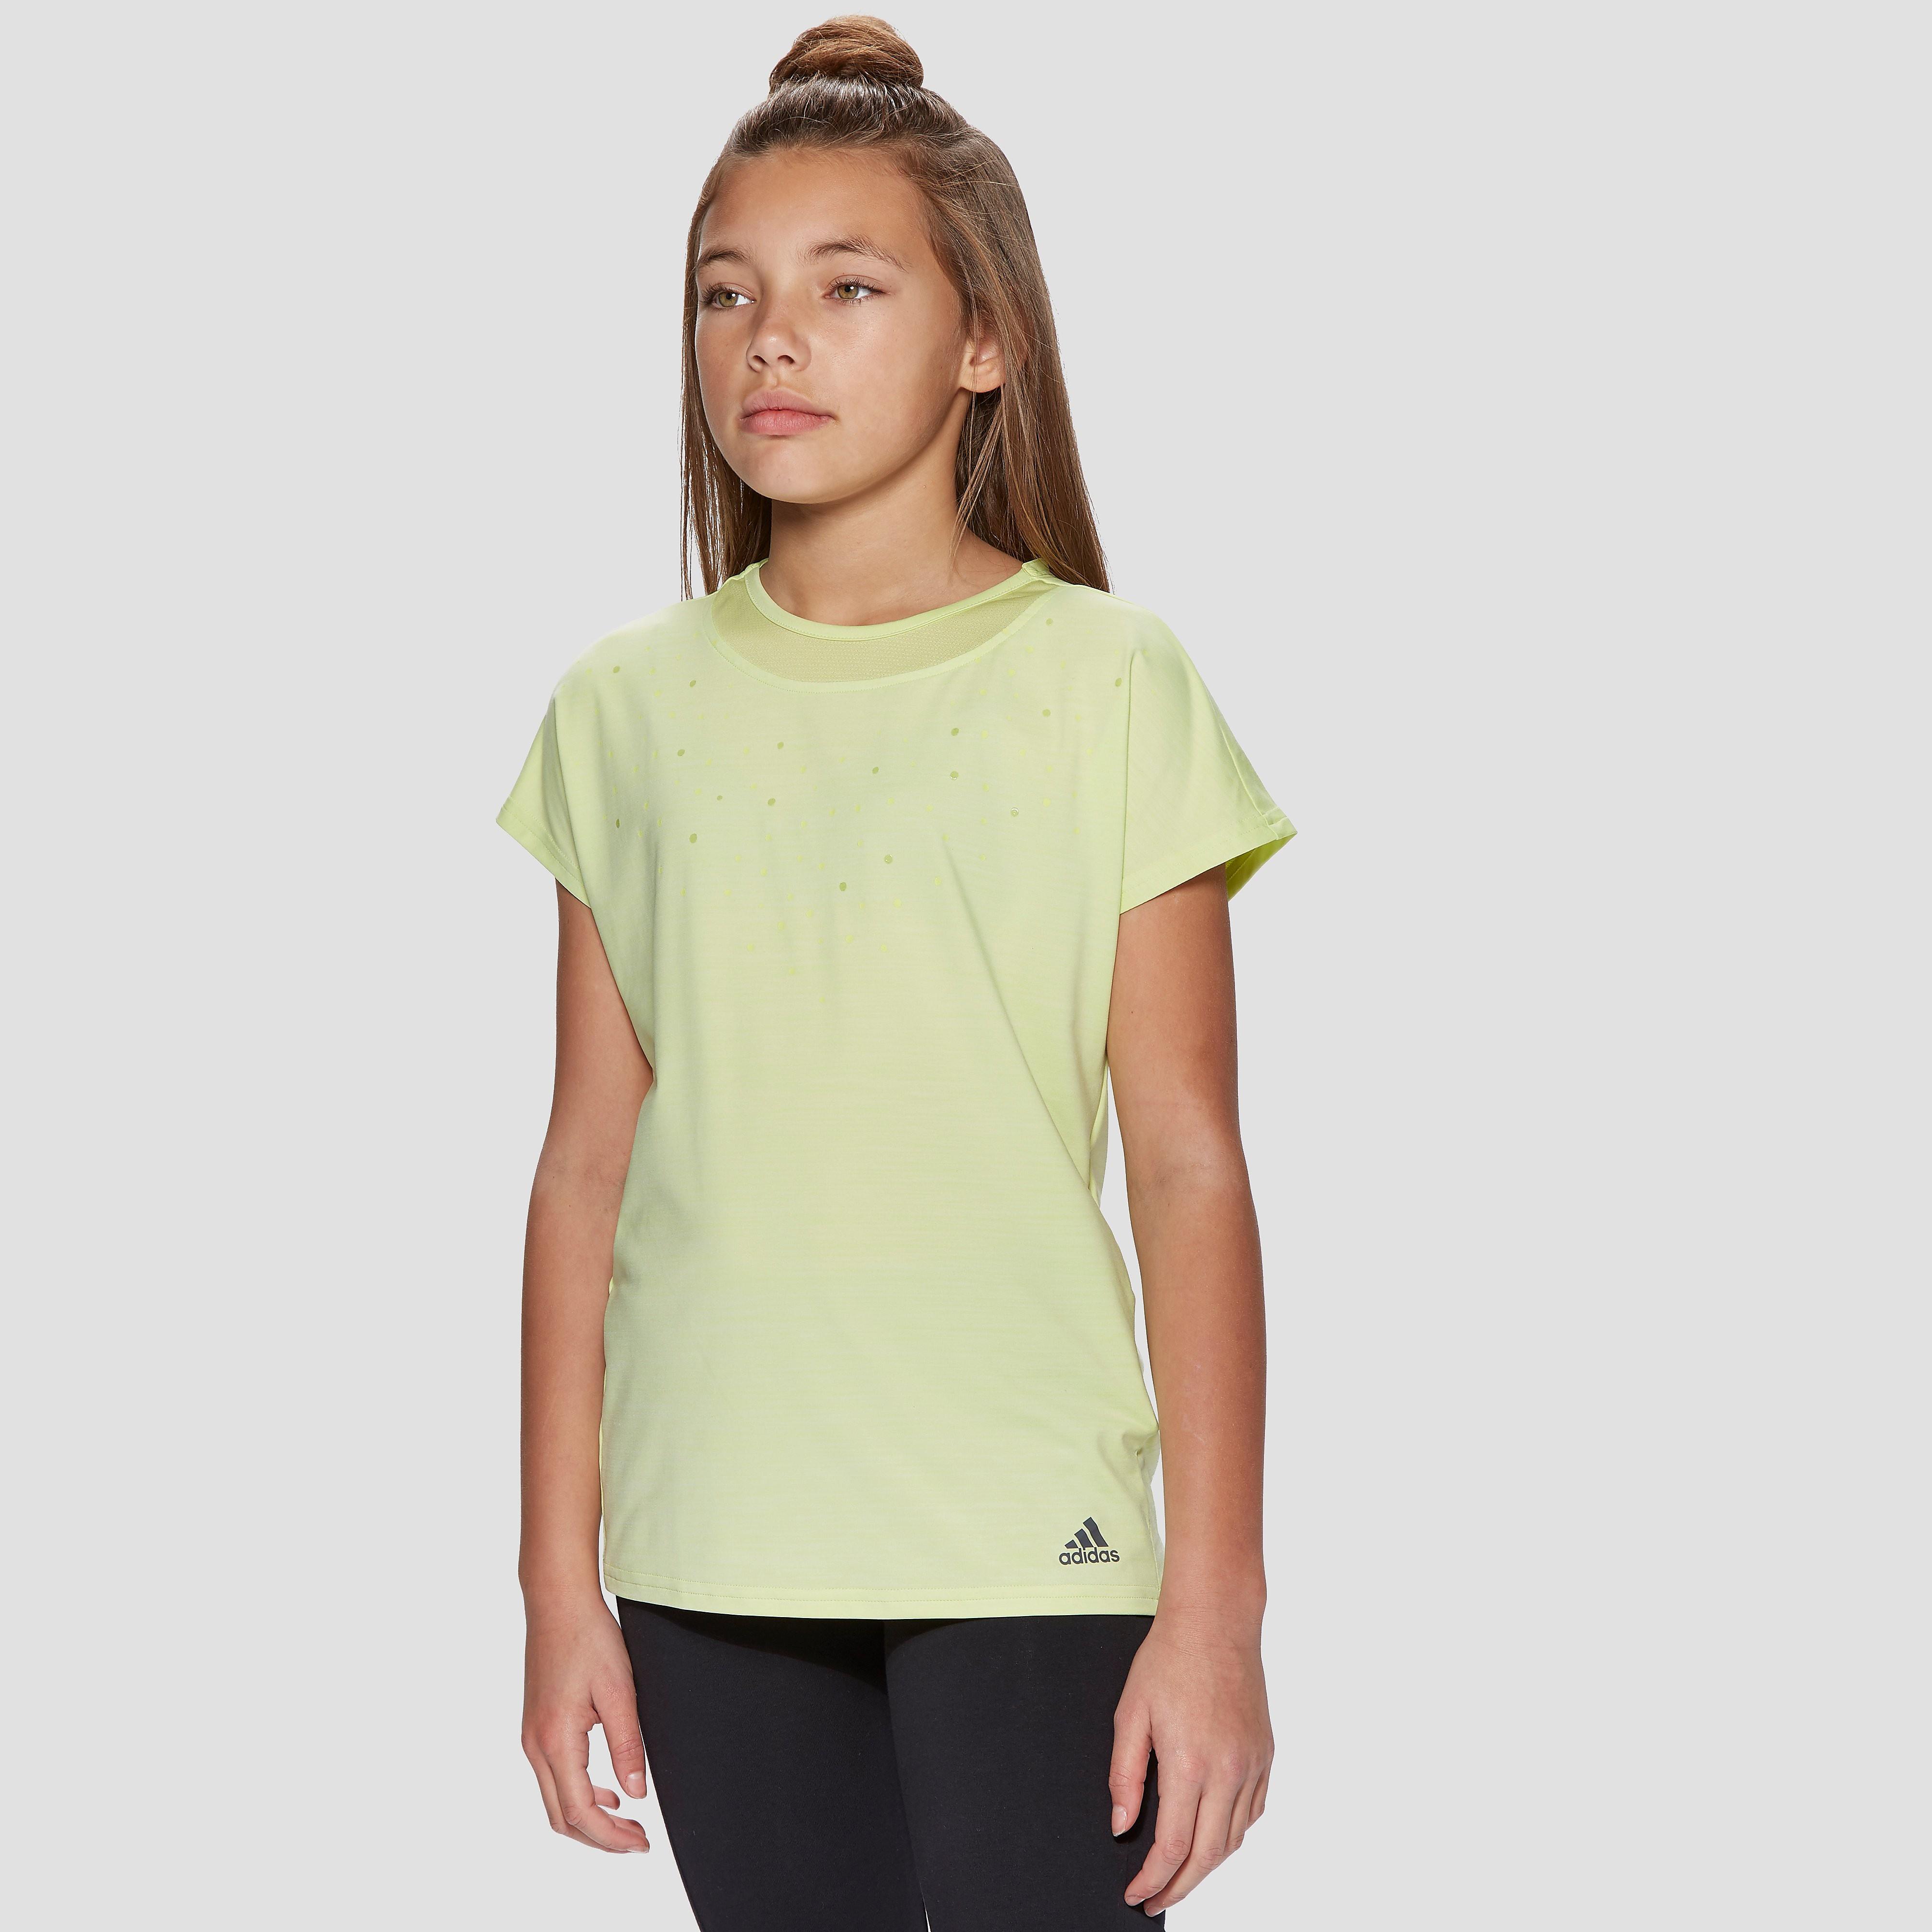 adidas Junior Dotty Tennis T-Shirt